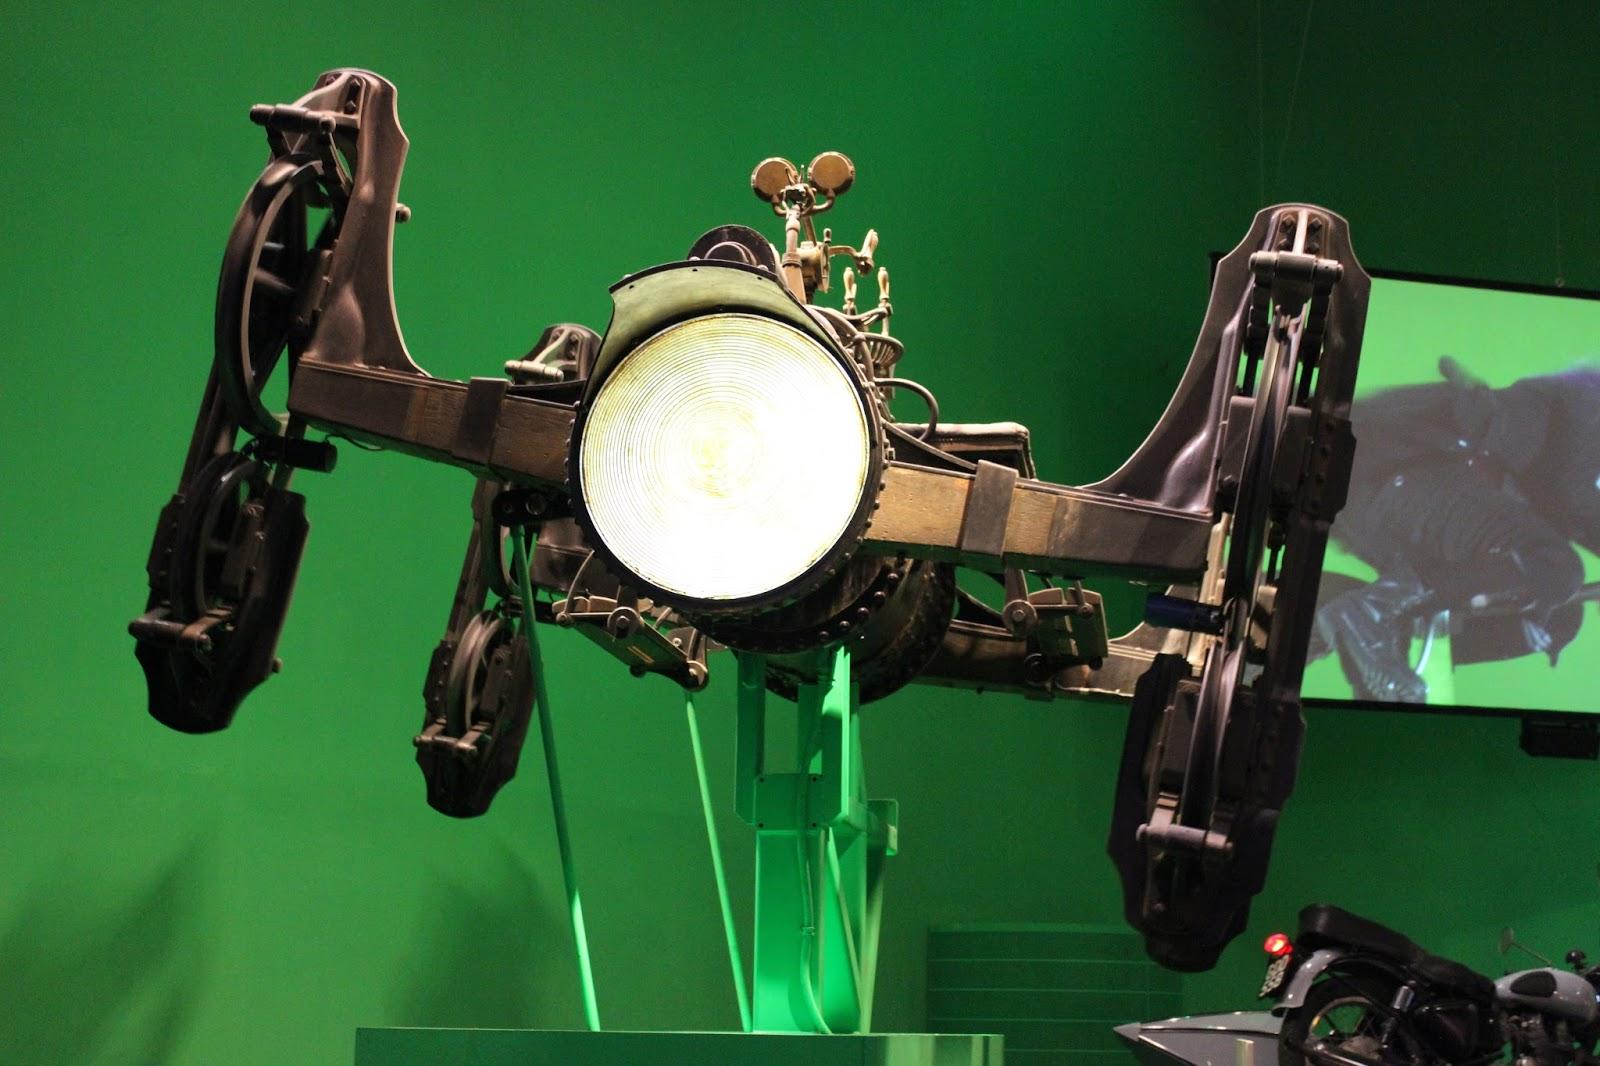 Harry Potter studio tour london green screen car